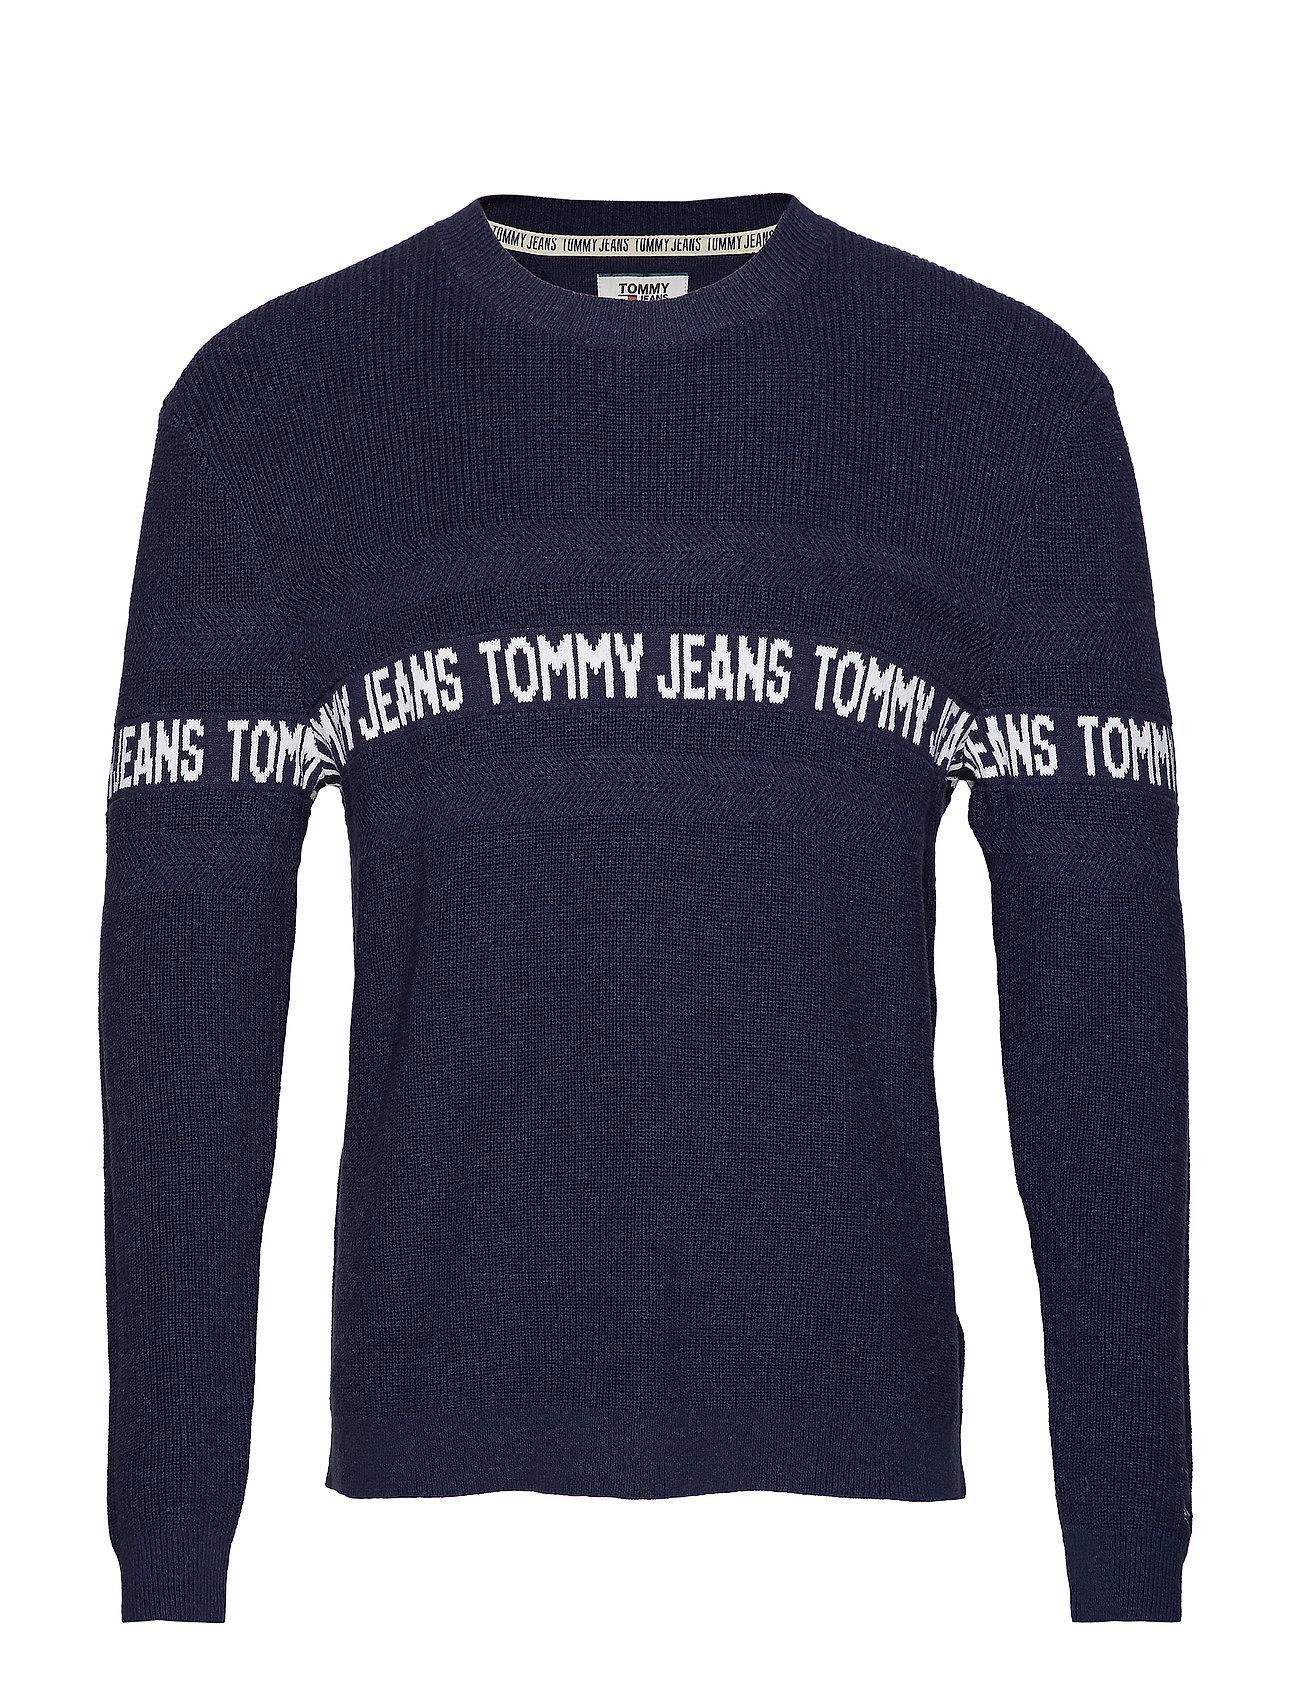 Tommy Jeans TJM TAPE SWEATER - BLACK IRIS